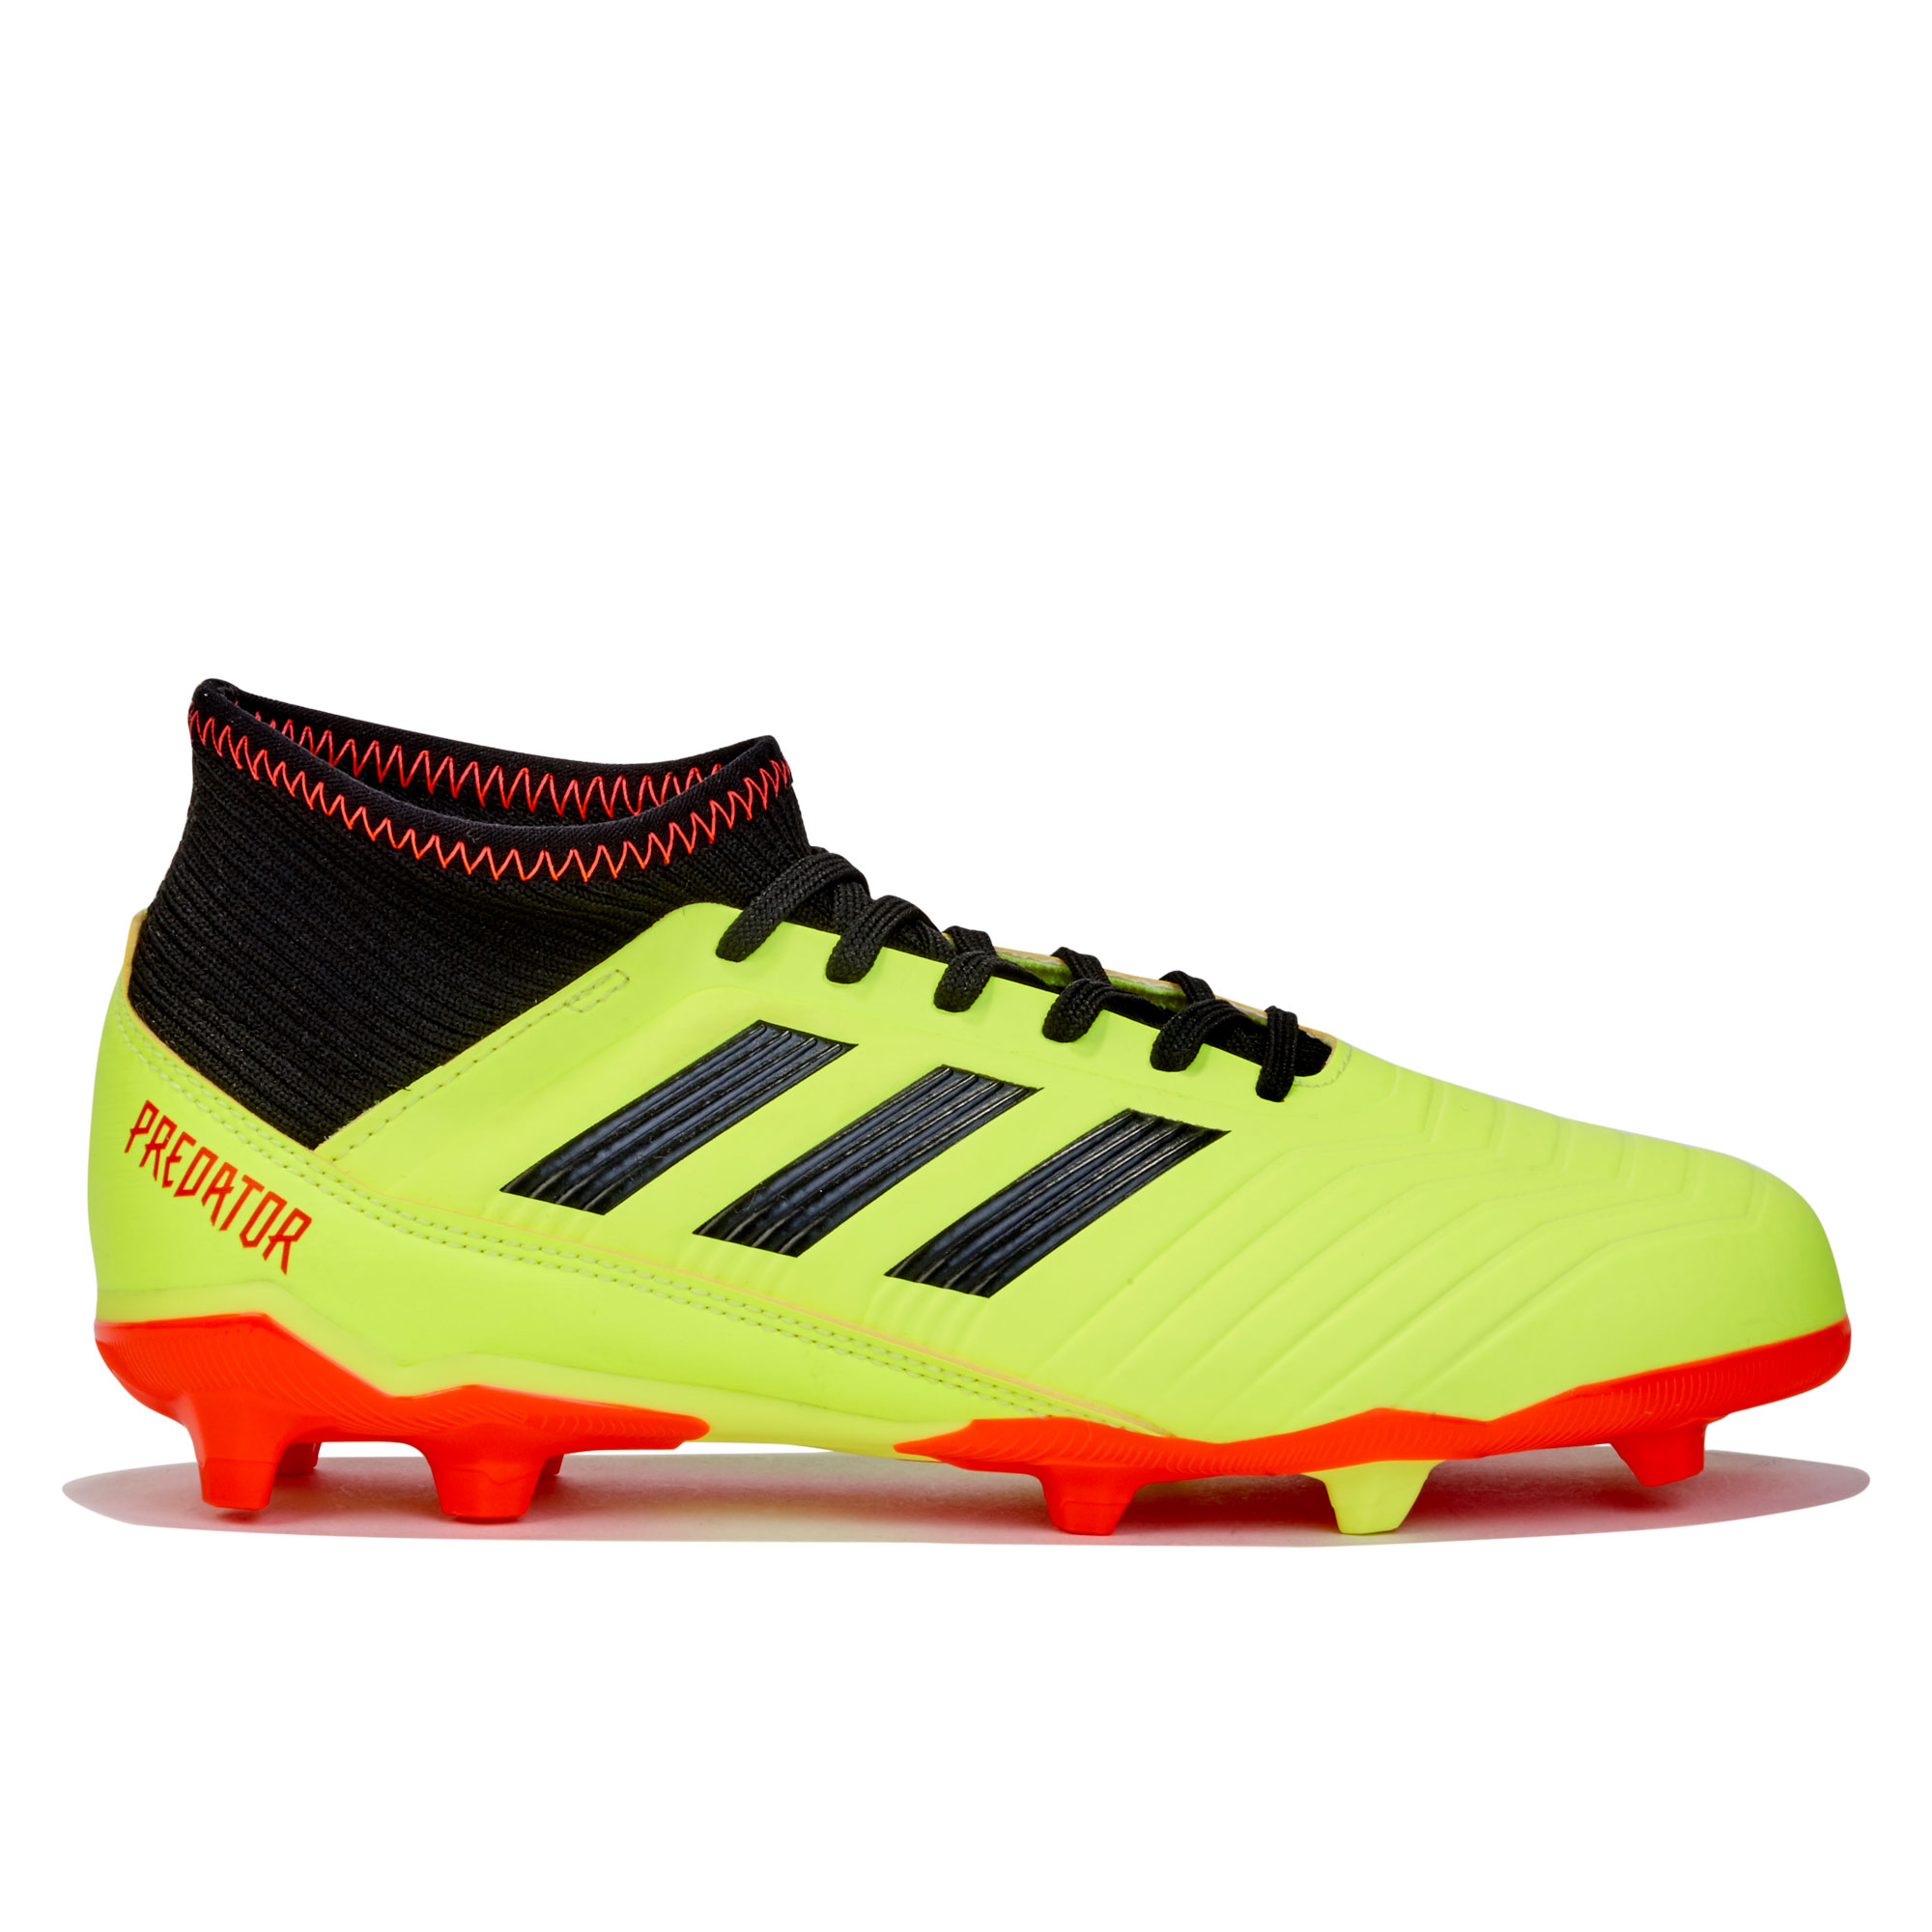 Image of adidas Predator 18.3 Firm Ground Football Boots - Yellow - Kids